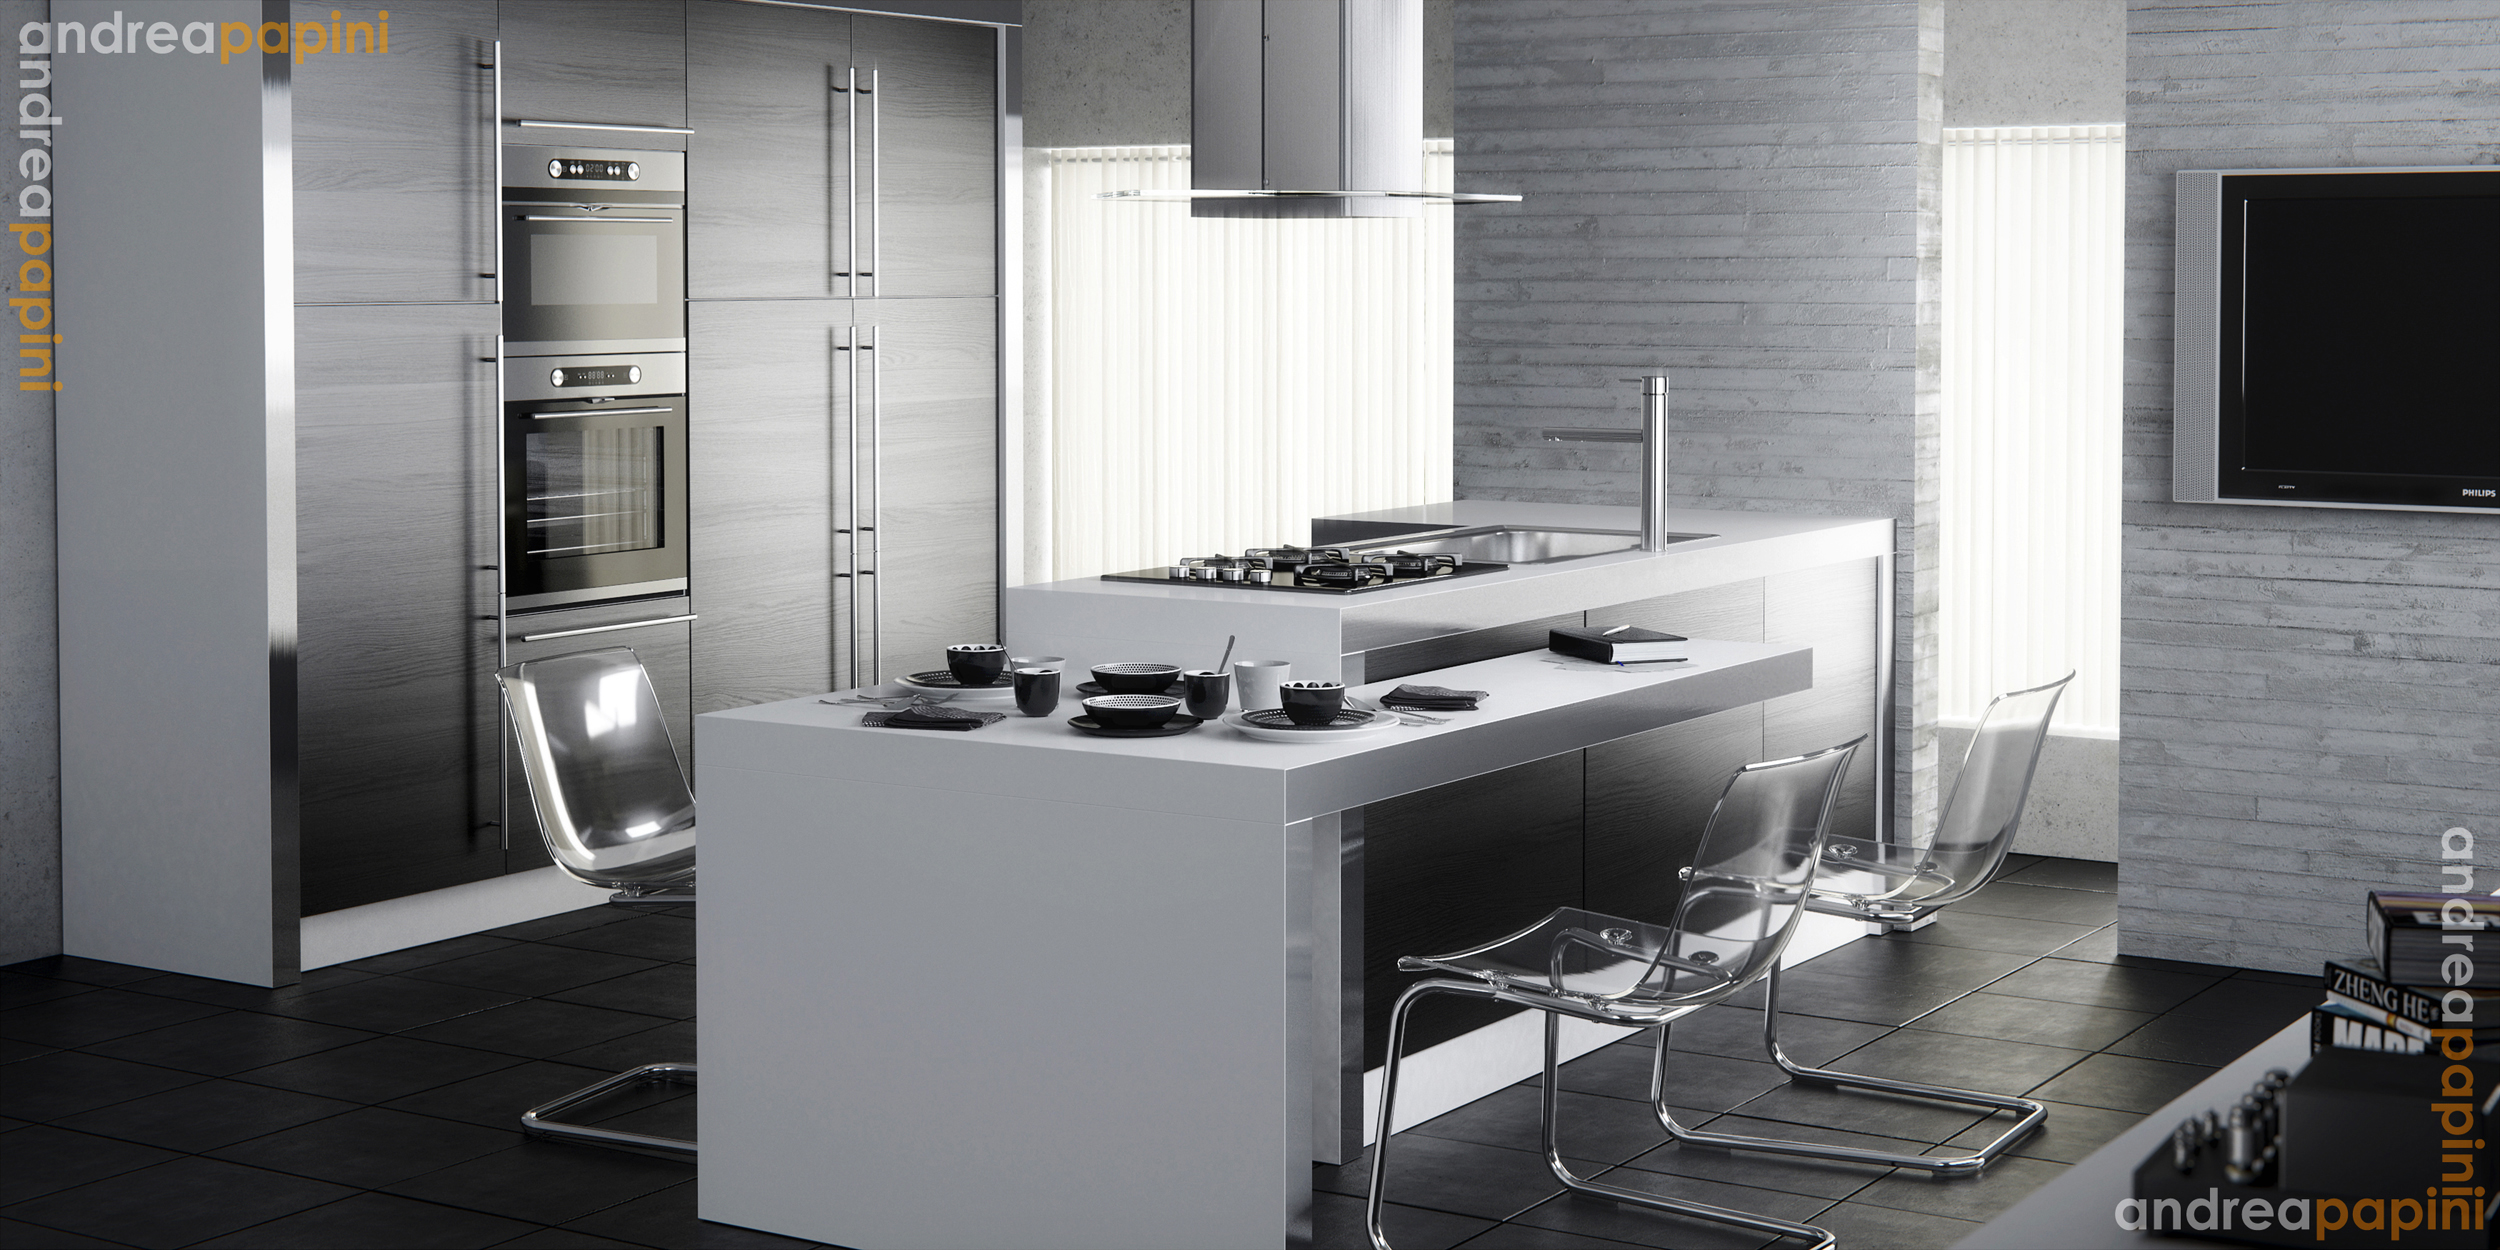 white kitchens white kitchen designs Designed by Andrea Papini